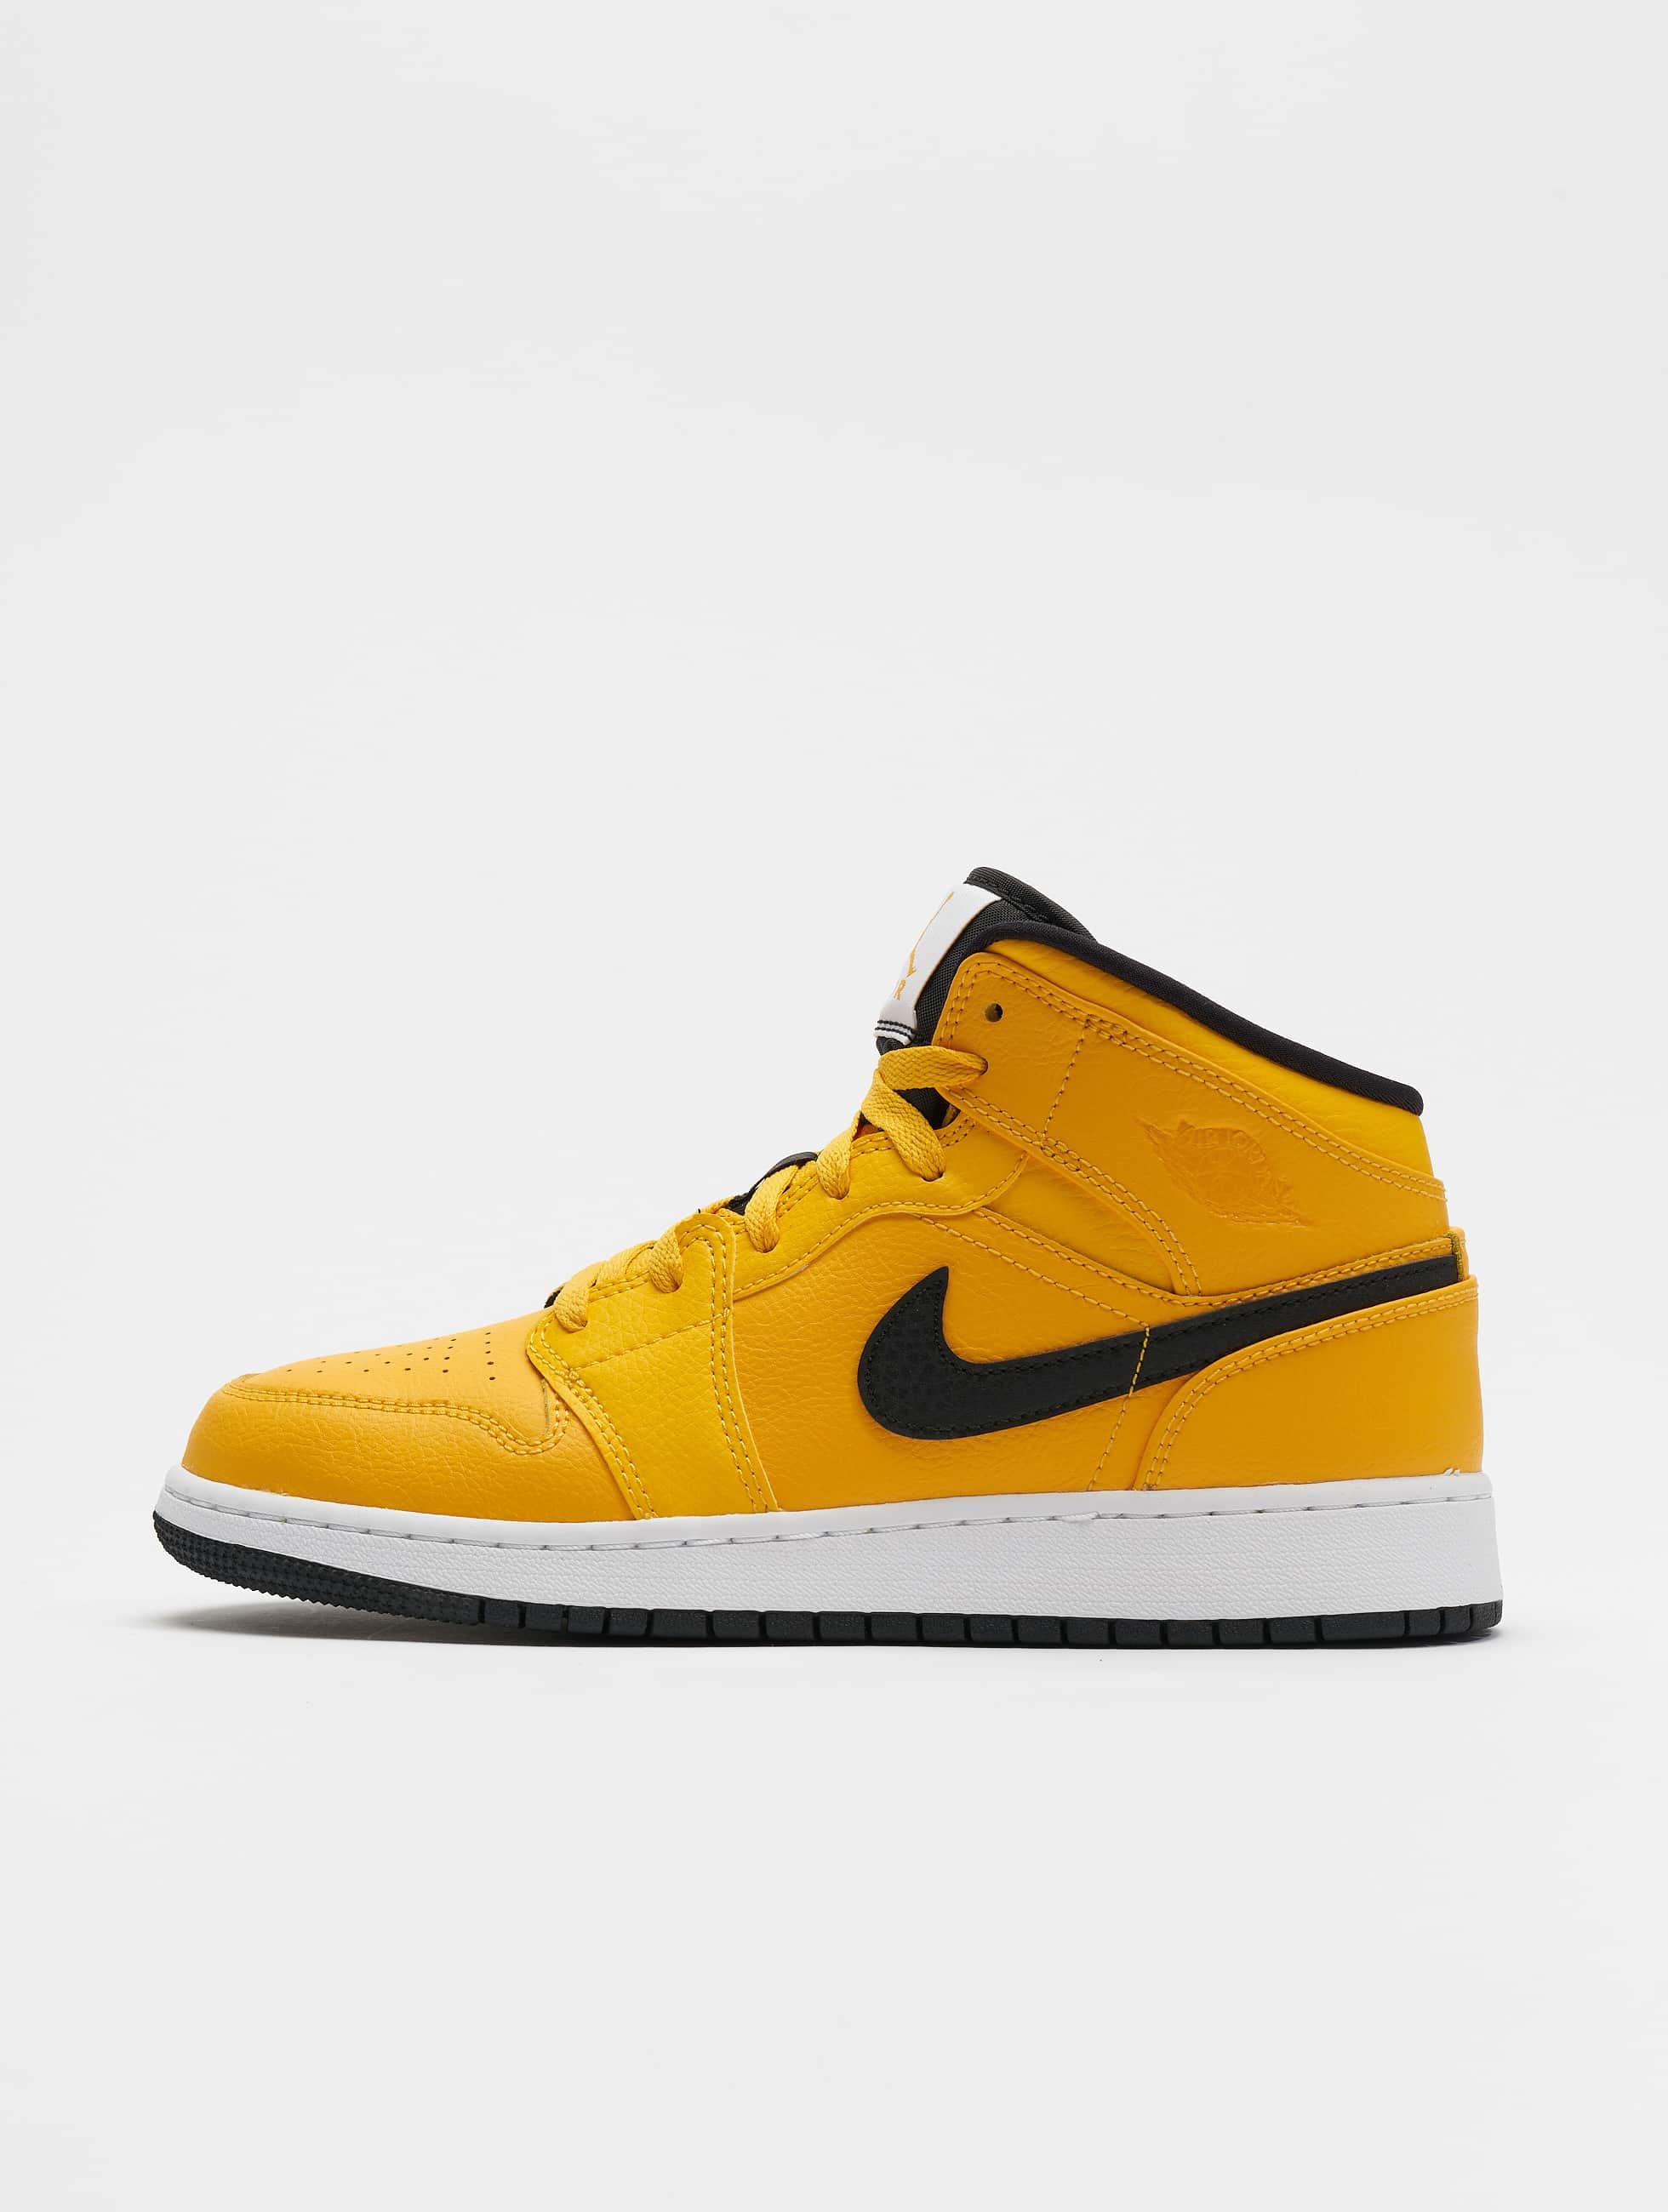 1 MidgsSneakers Red Goldenblackwhitegym Nike Jordan Air University QBWderCox